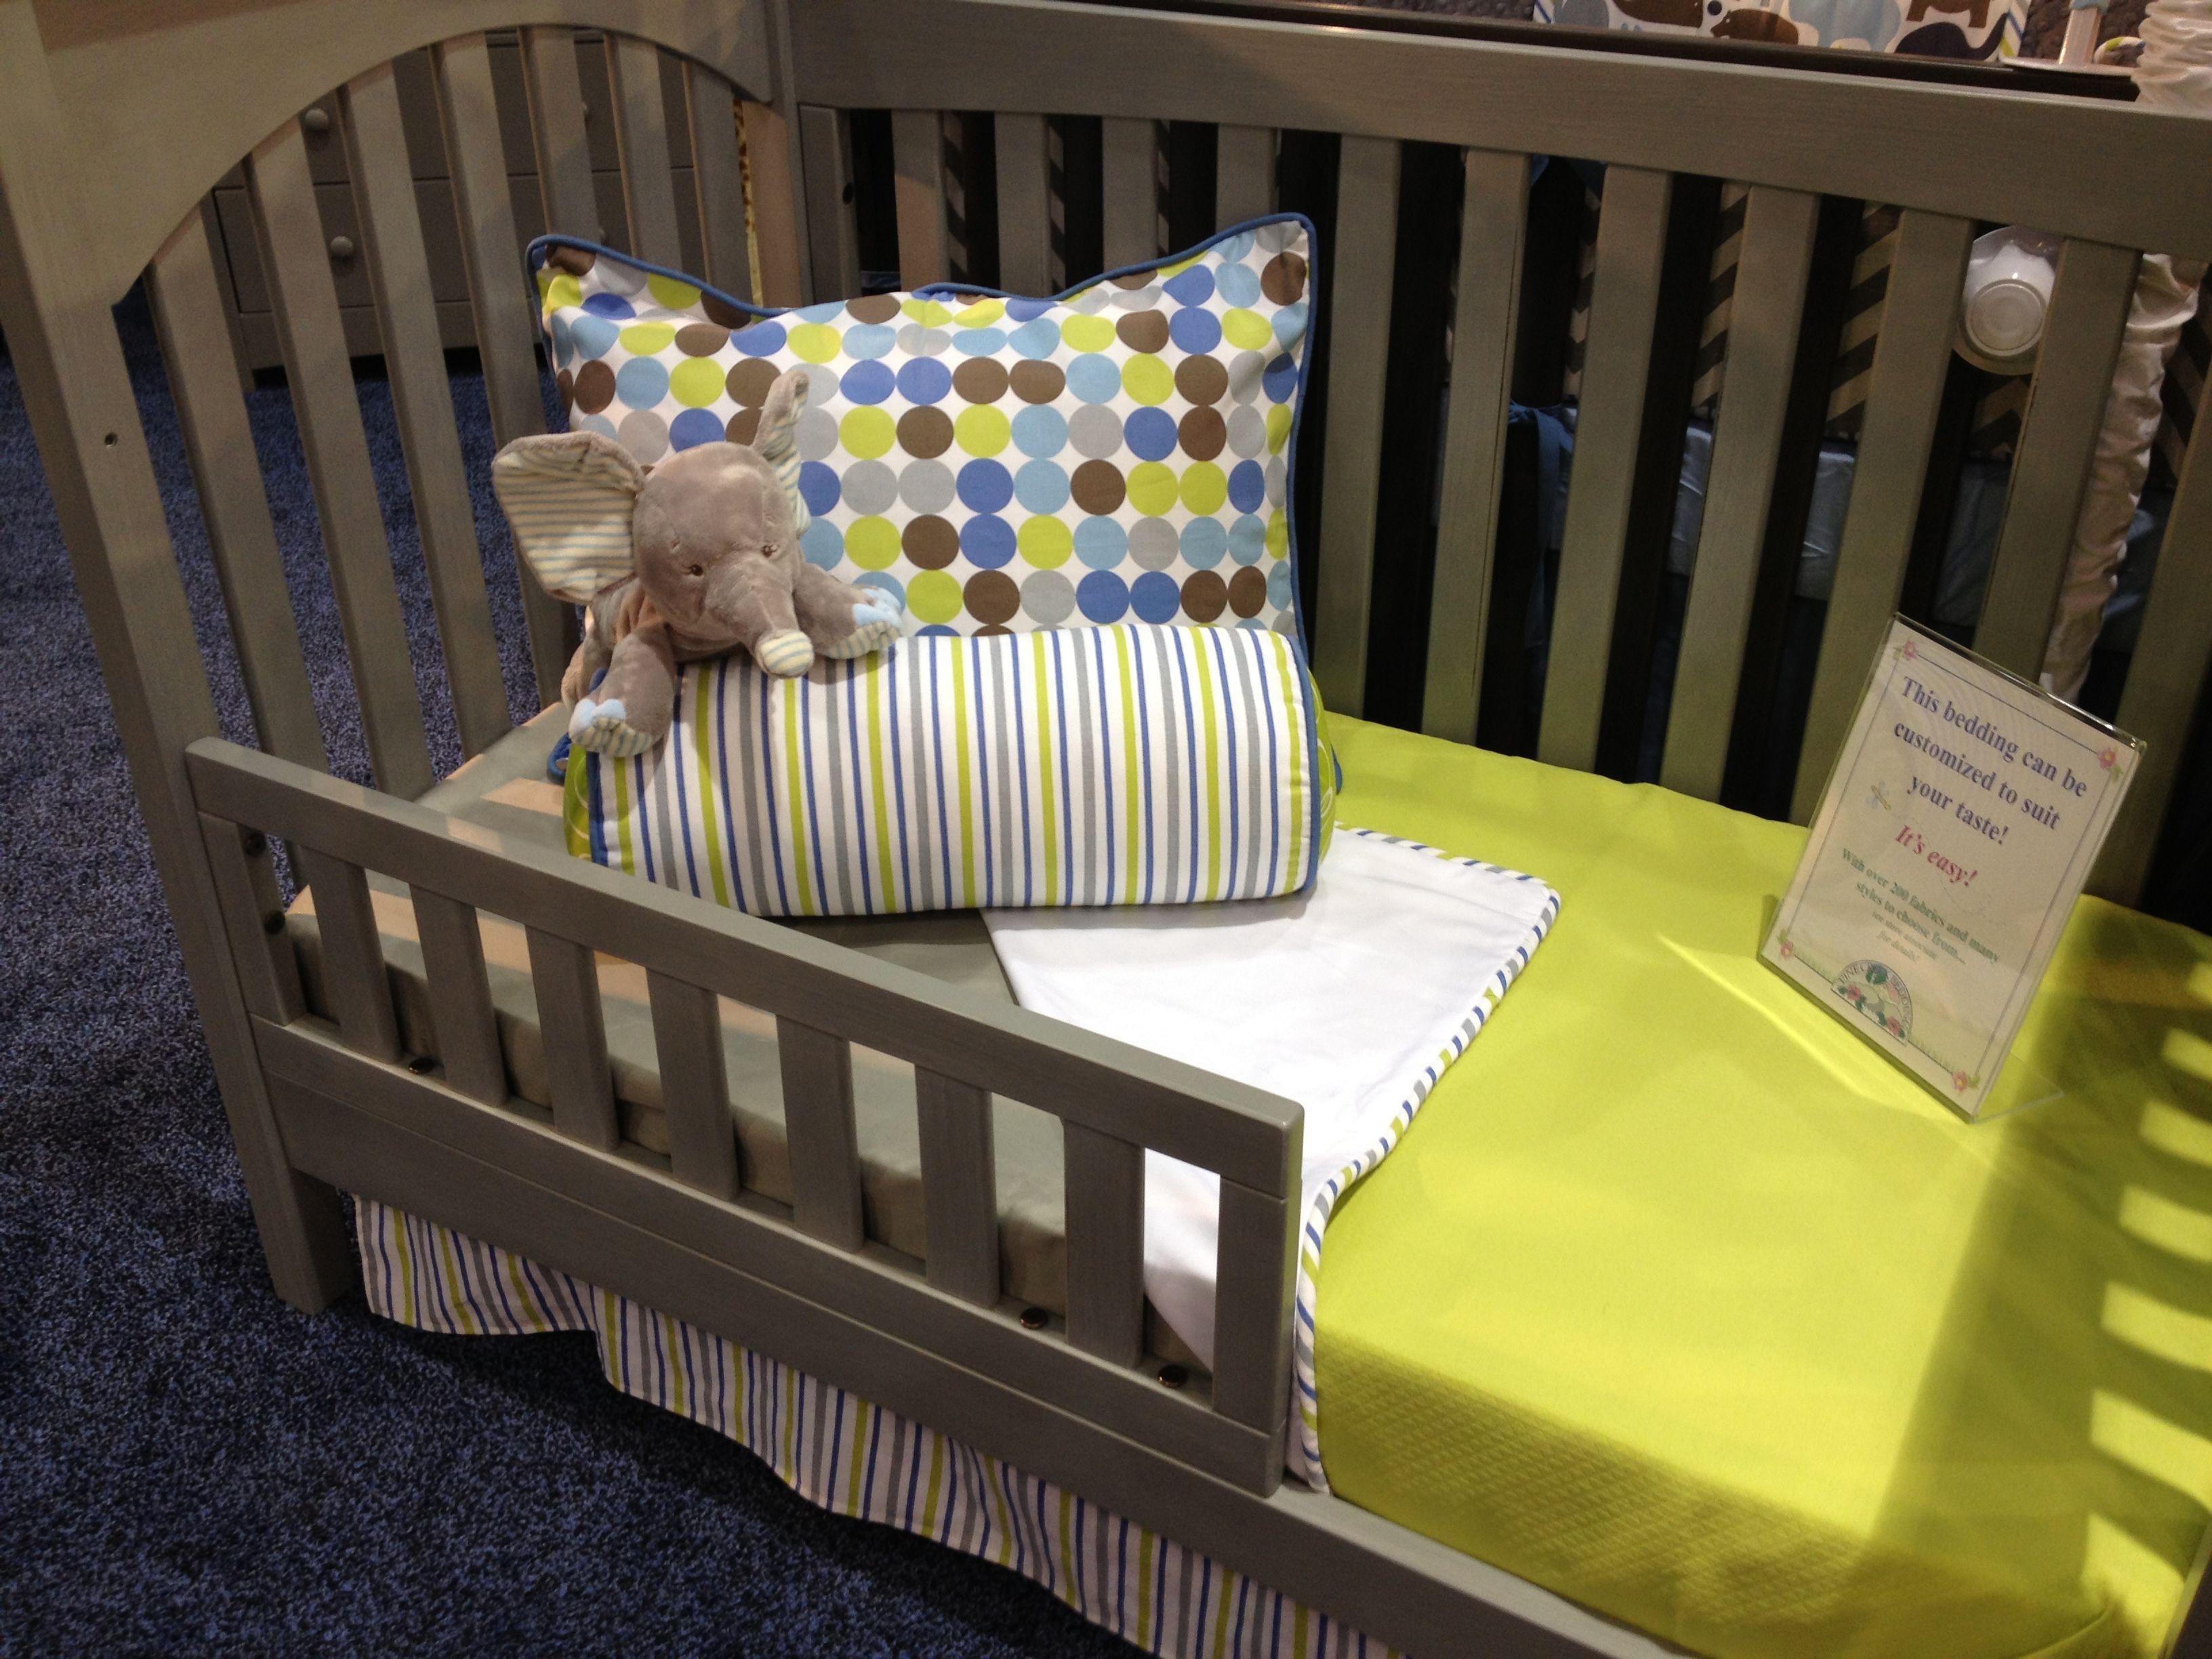 brie stationary cribs espresso x dream of photo convertible baby s crib att nice